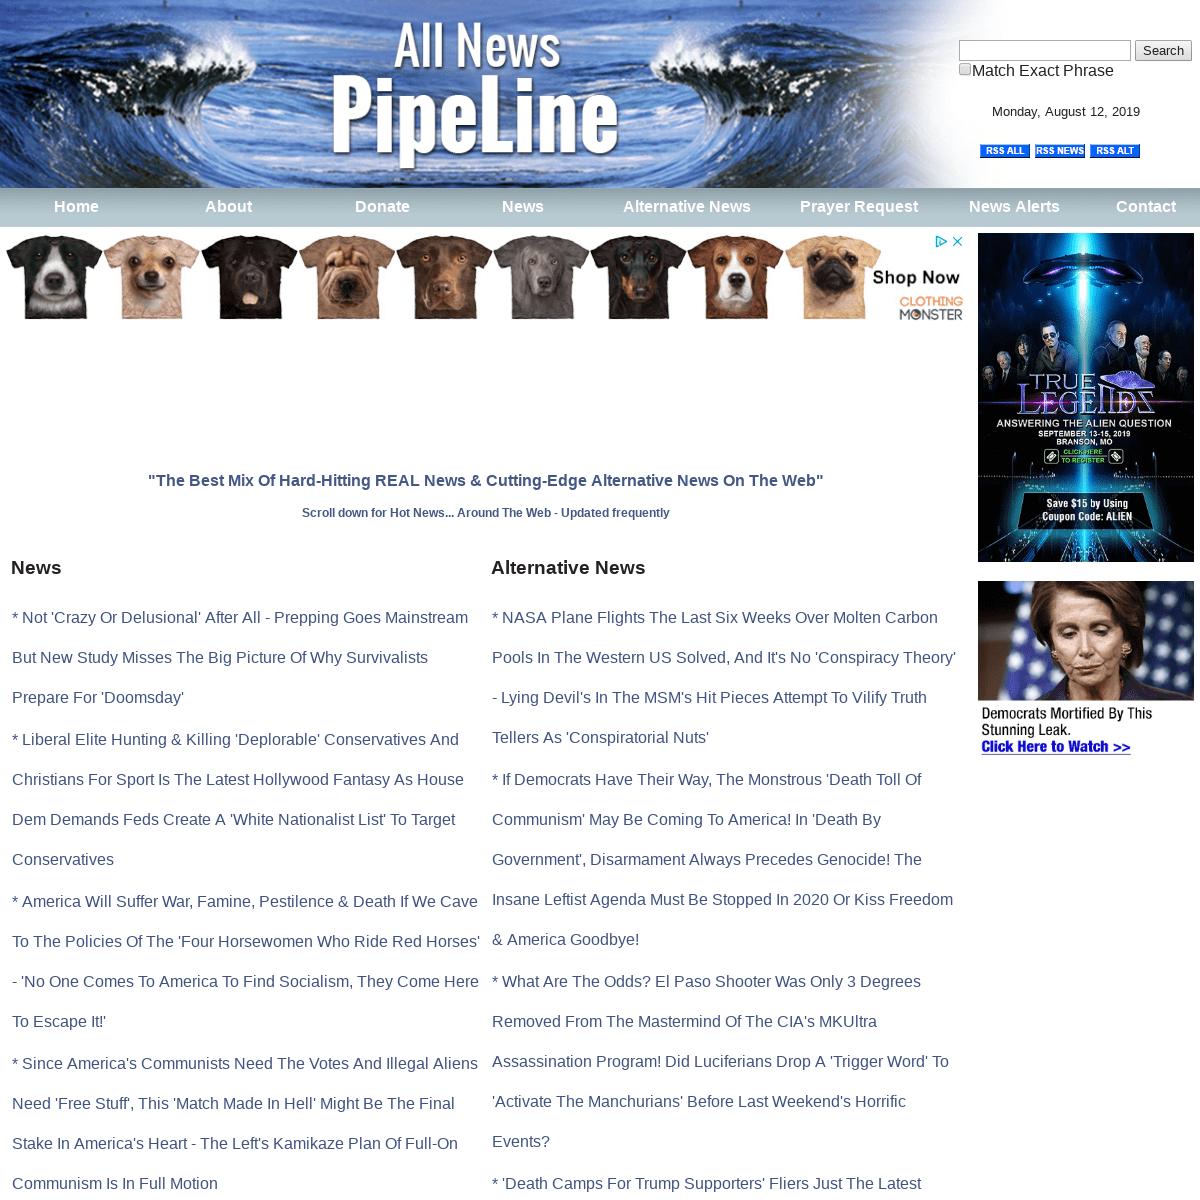 A complete backup of allnewspipeline.com